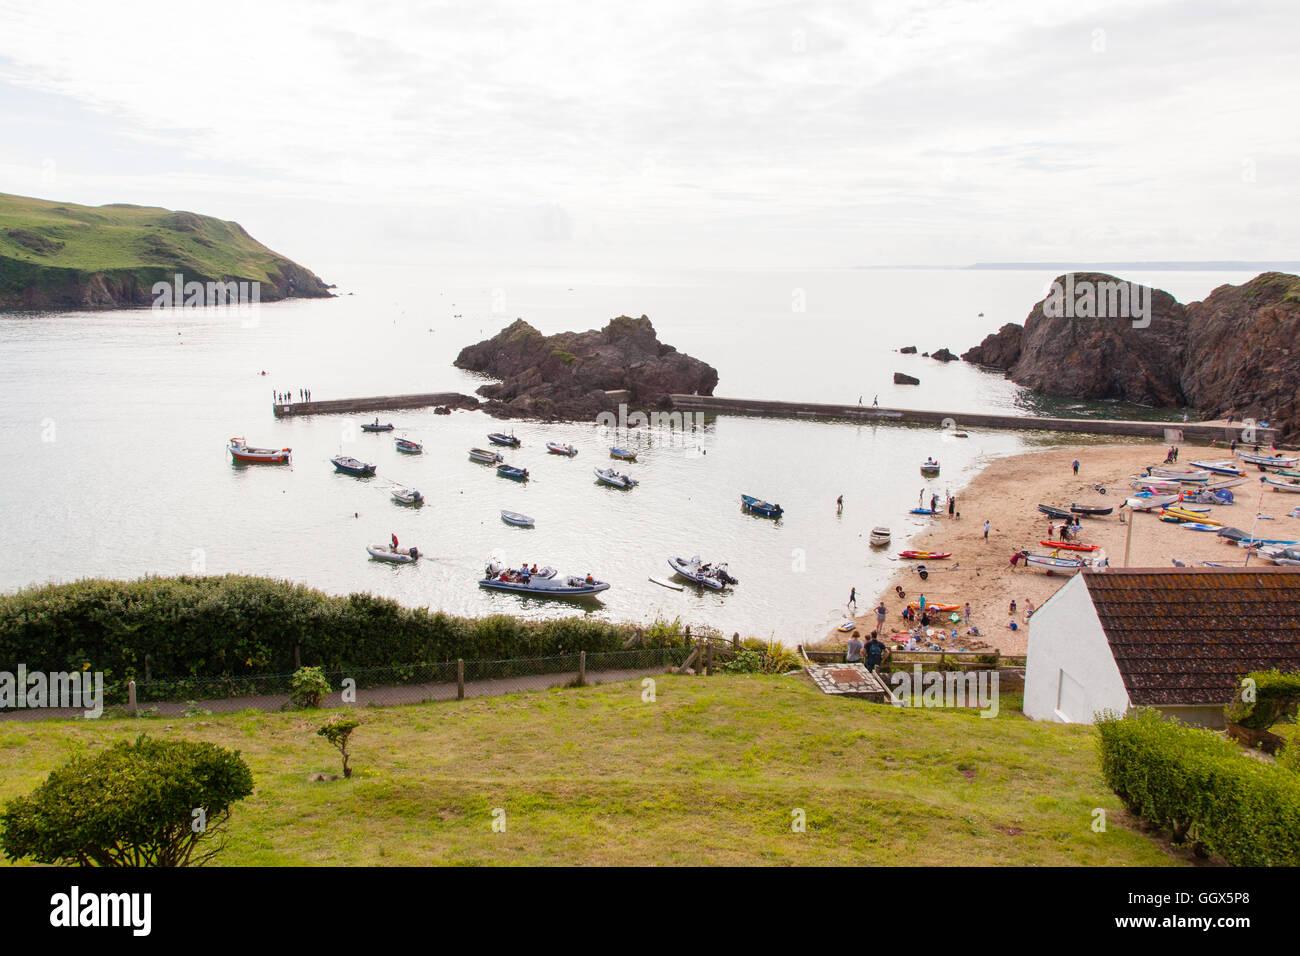 Hope Cove, South Hams, Devon, England, United Kingdom. - Stock Image